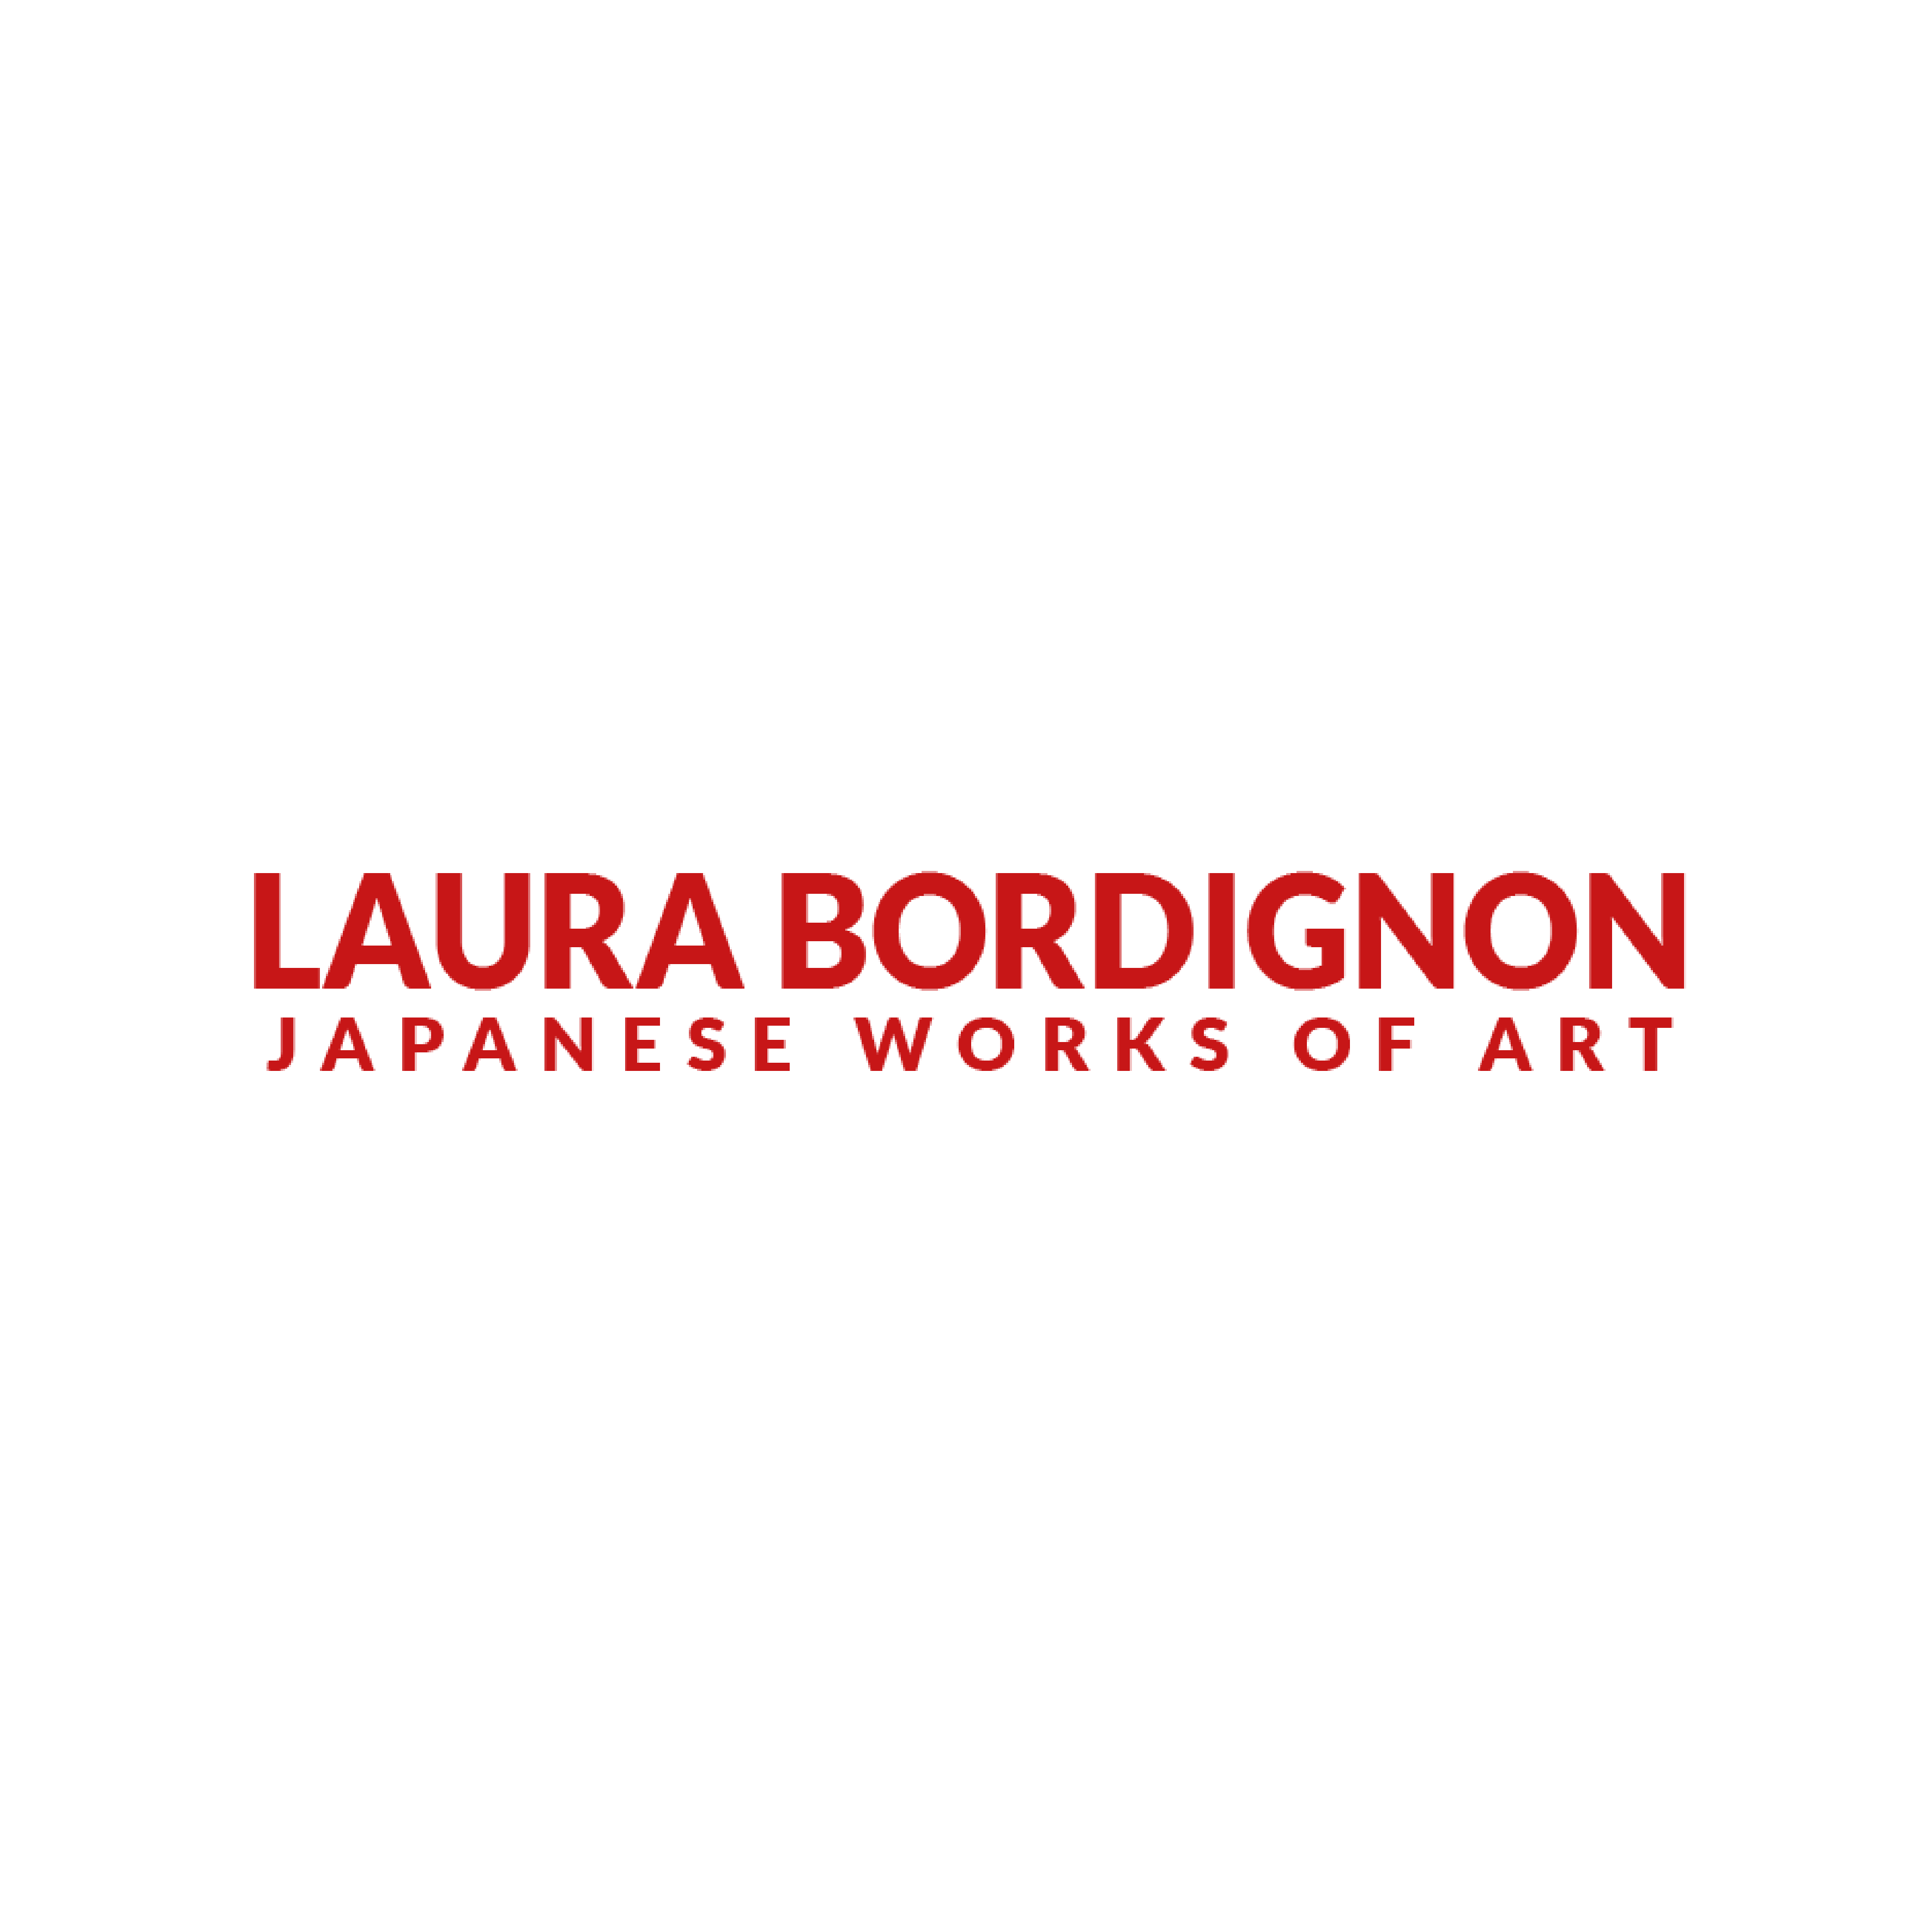 Laura Bordingnon